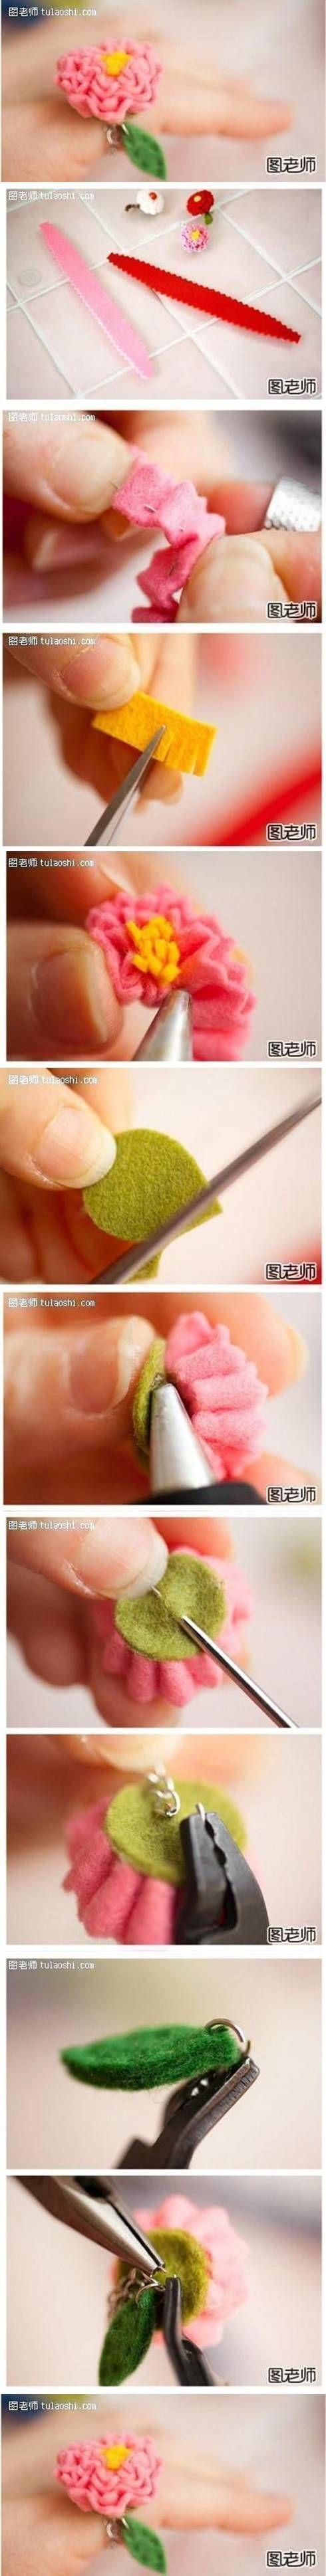 DIY Romantic Flower Ring DIY Projects